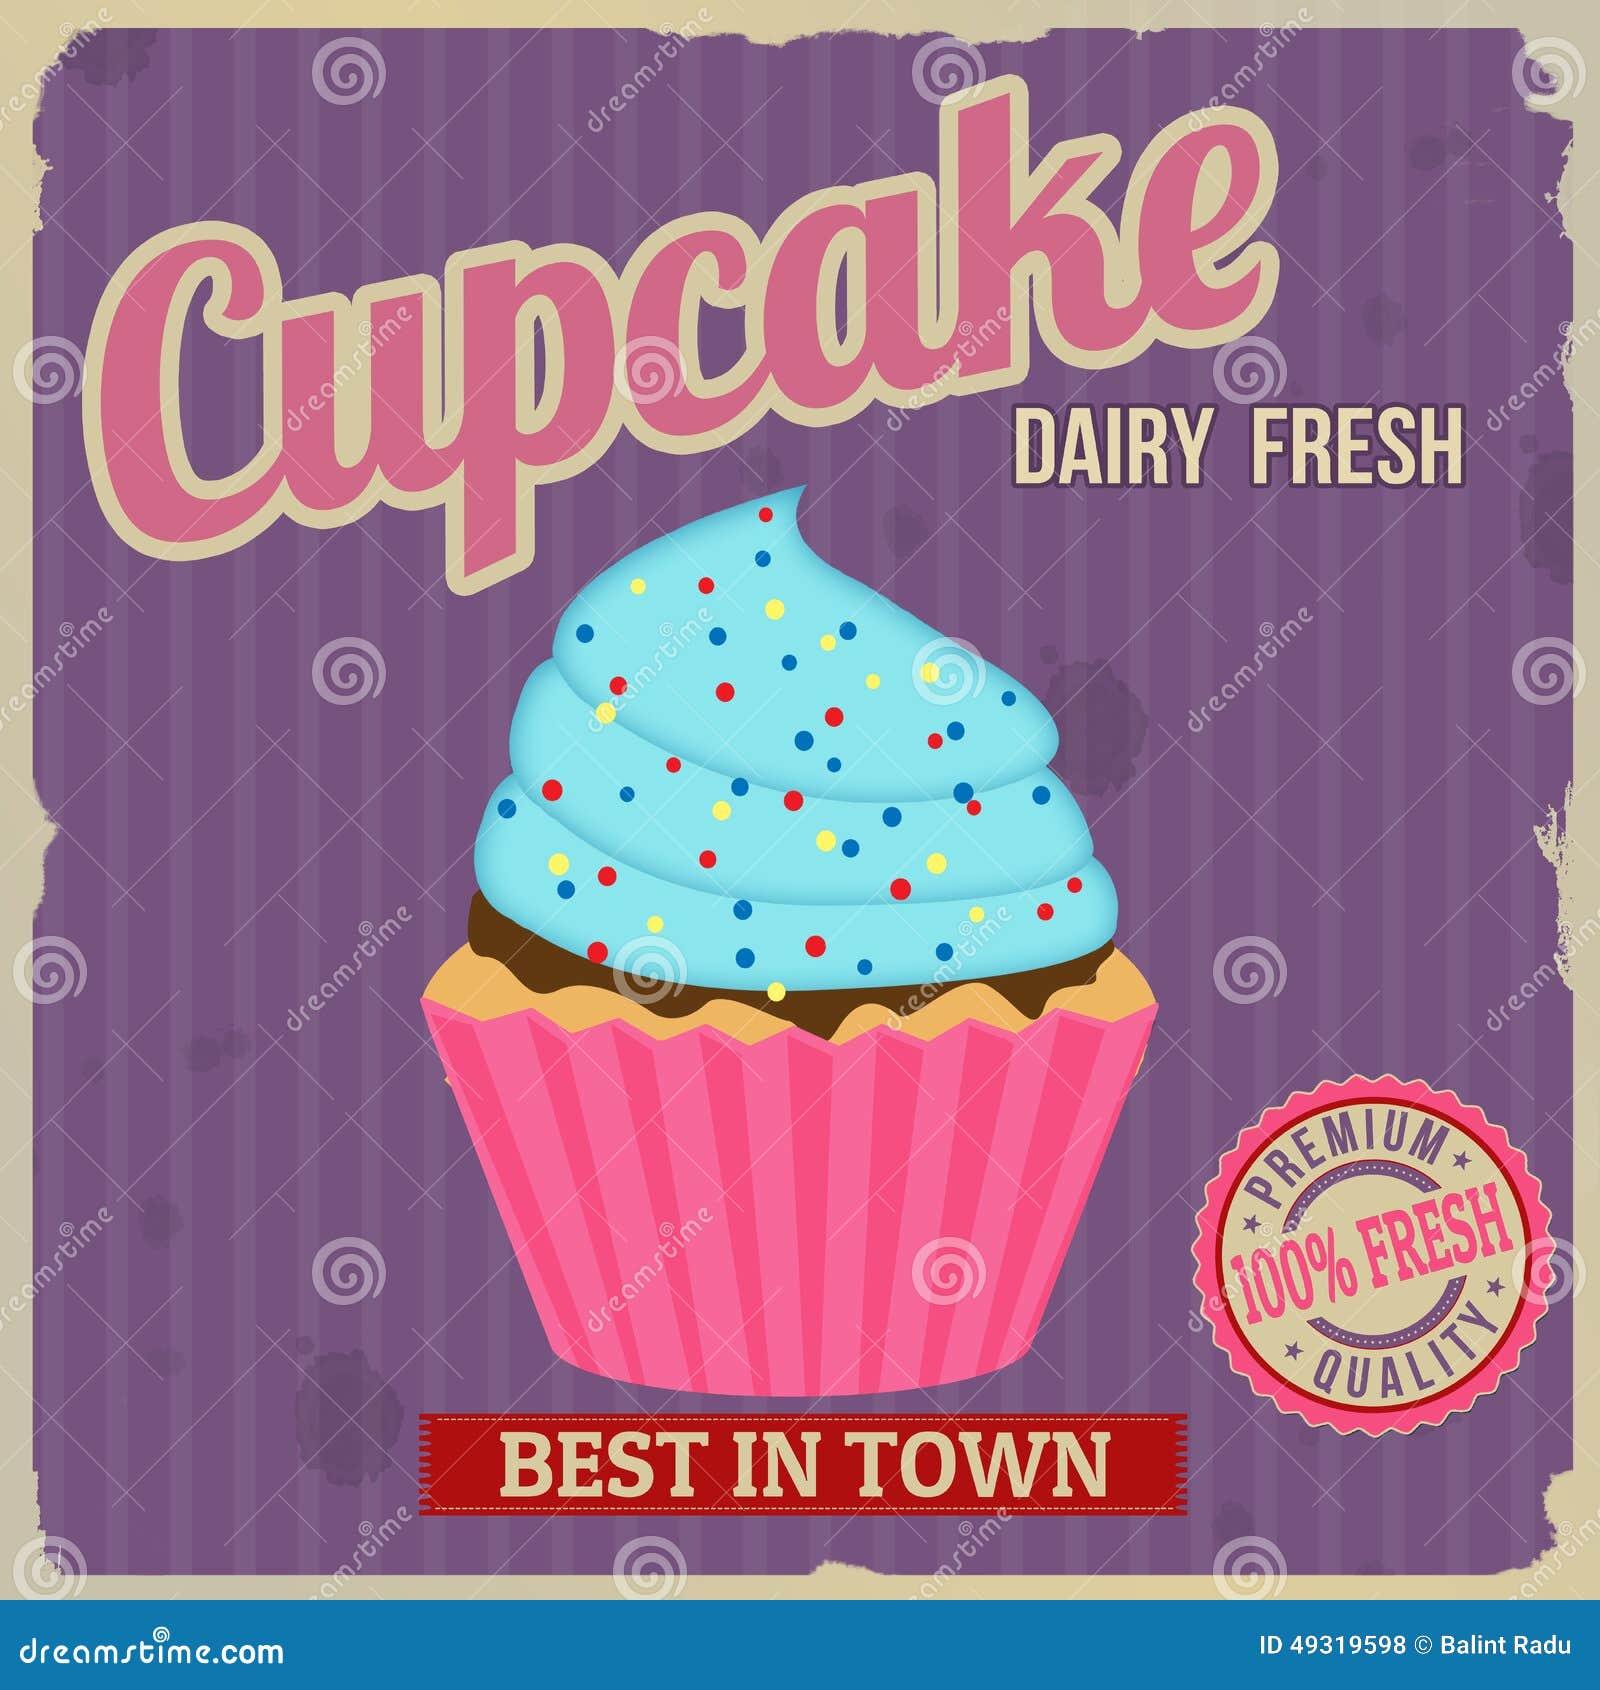 Cupcake retro poster